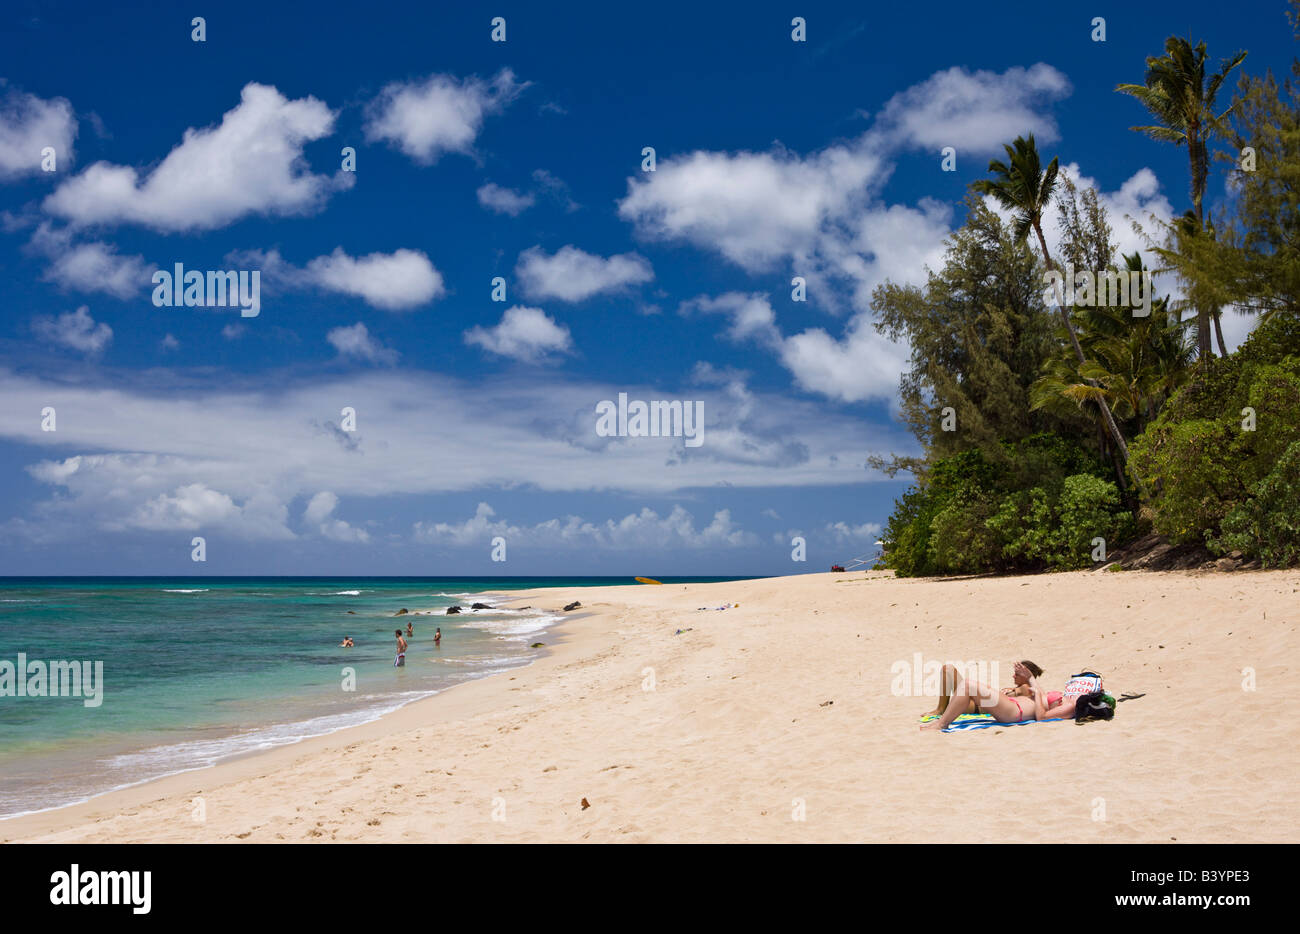 Beach of Haleiwa Beach Park Oahu Pacific Ocean Hawaii USA - Stock Image